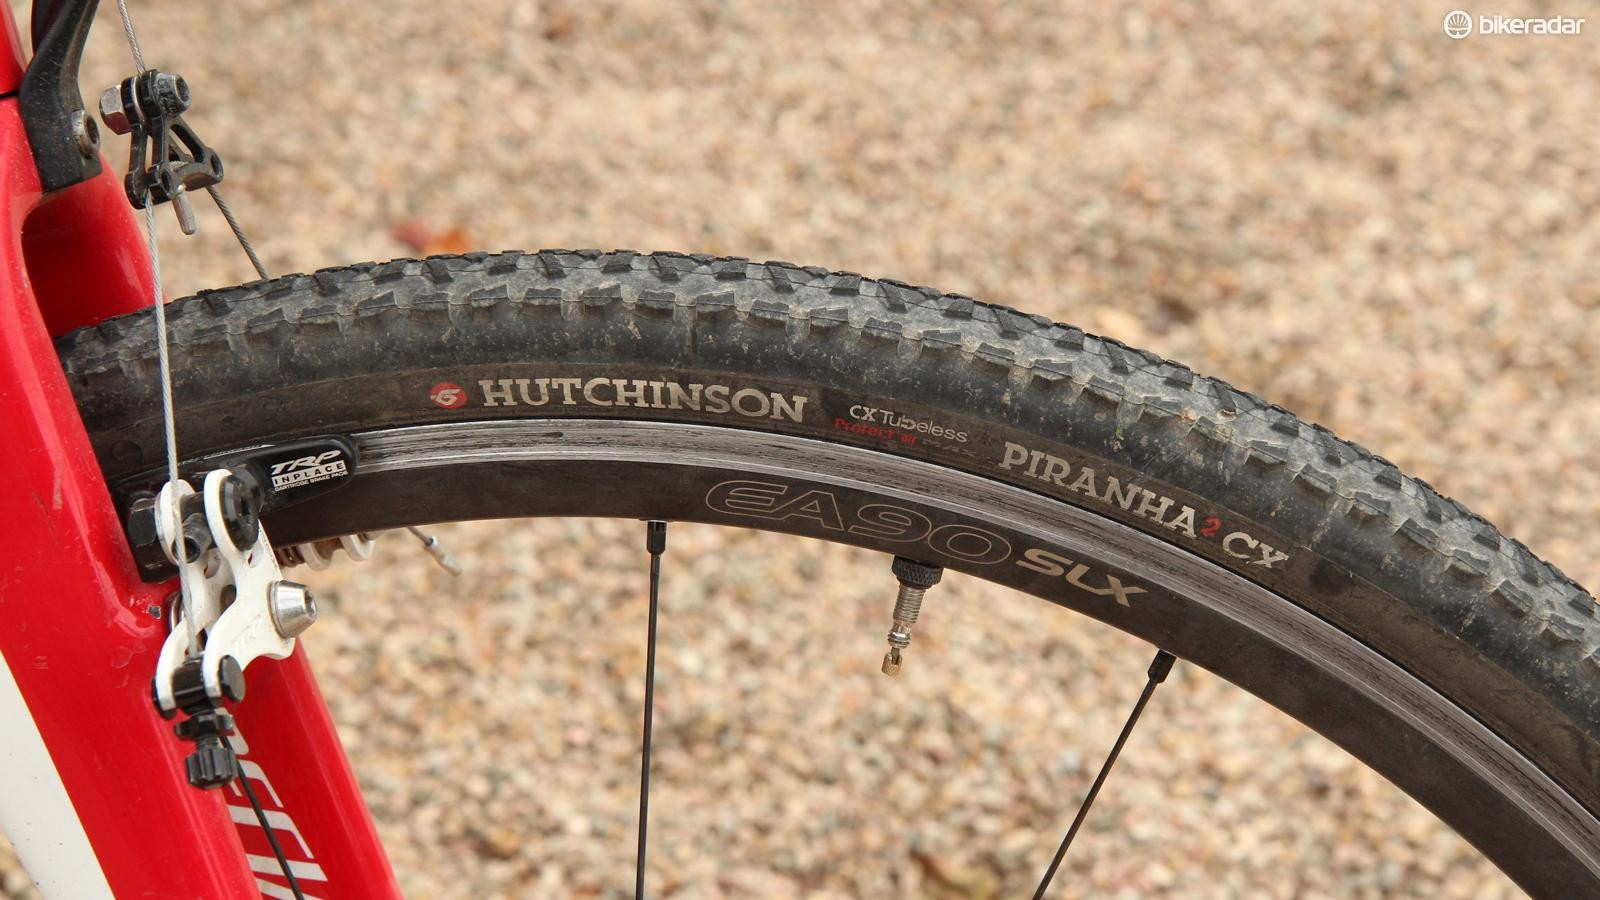 Hutchinson's Piranha 2 CX tubeless tire